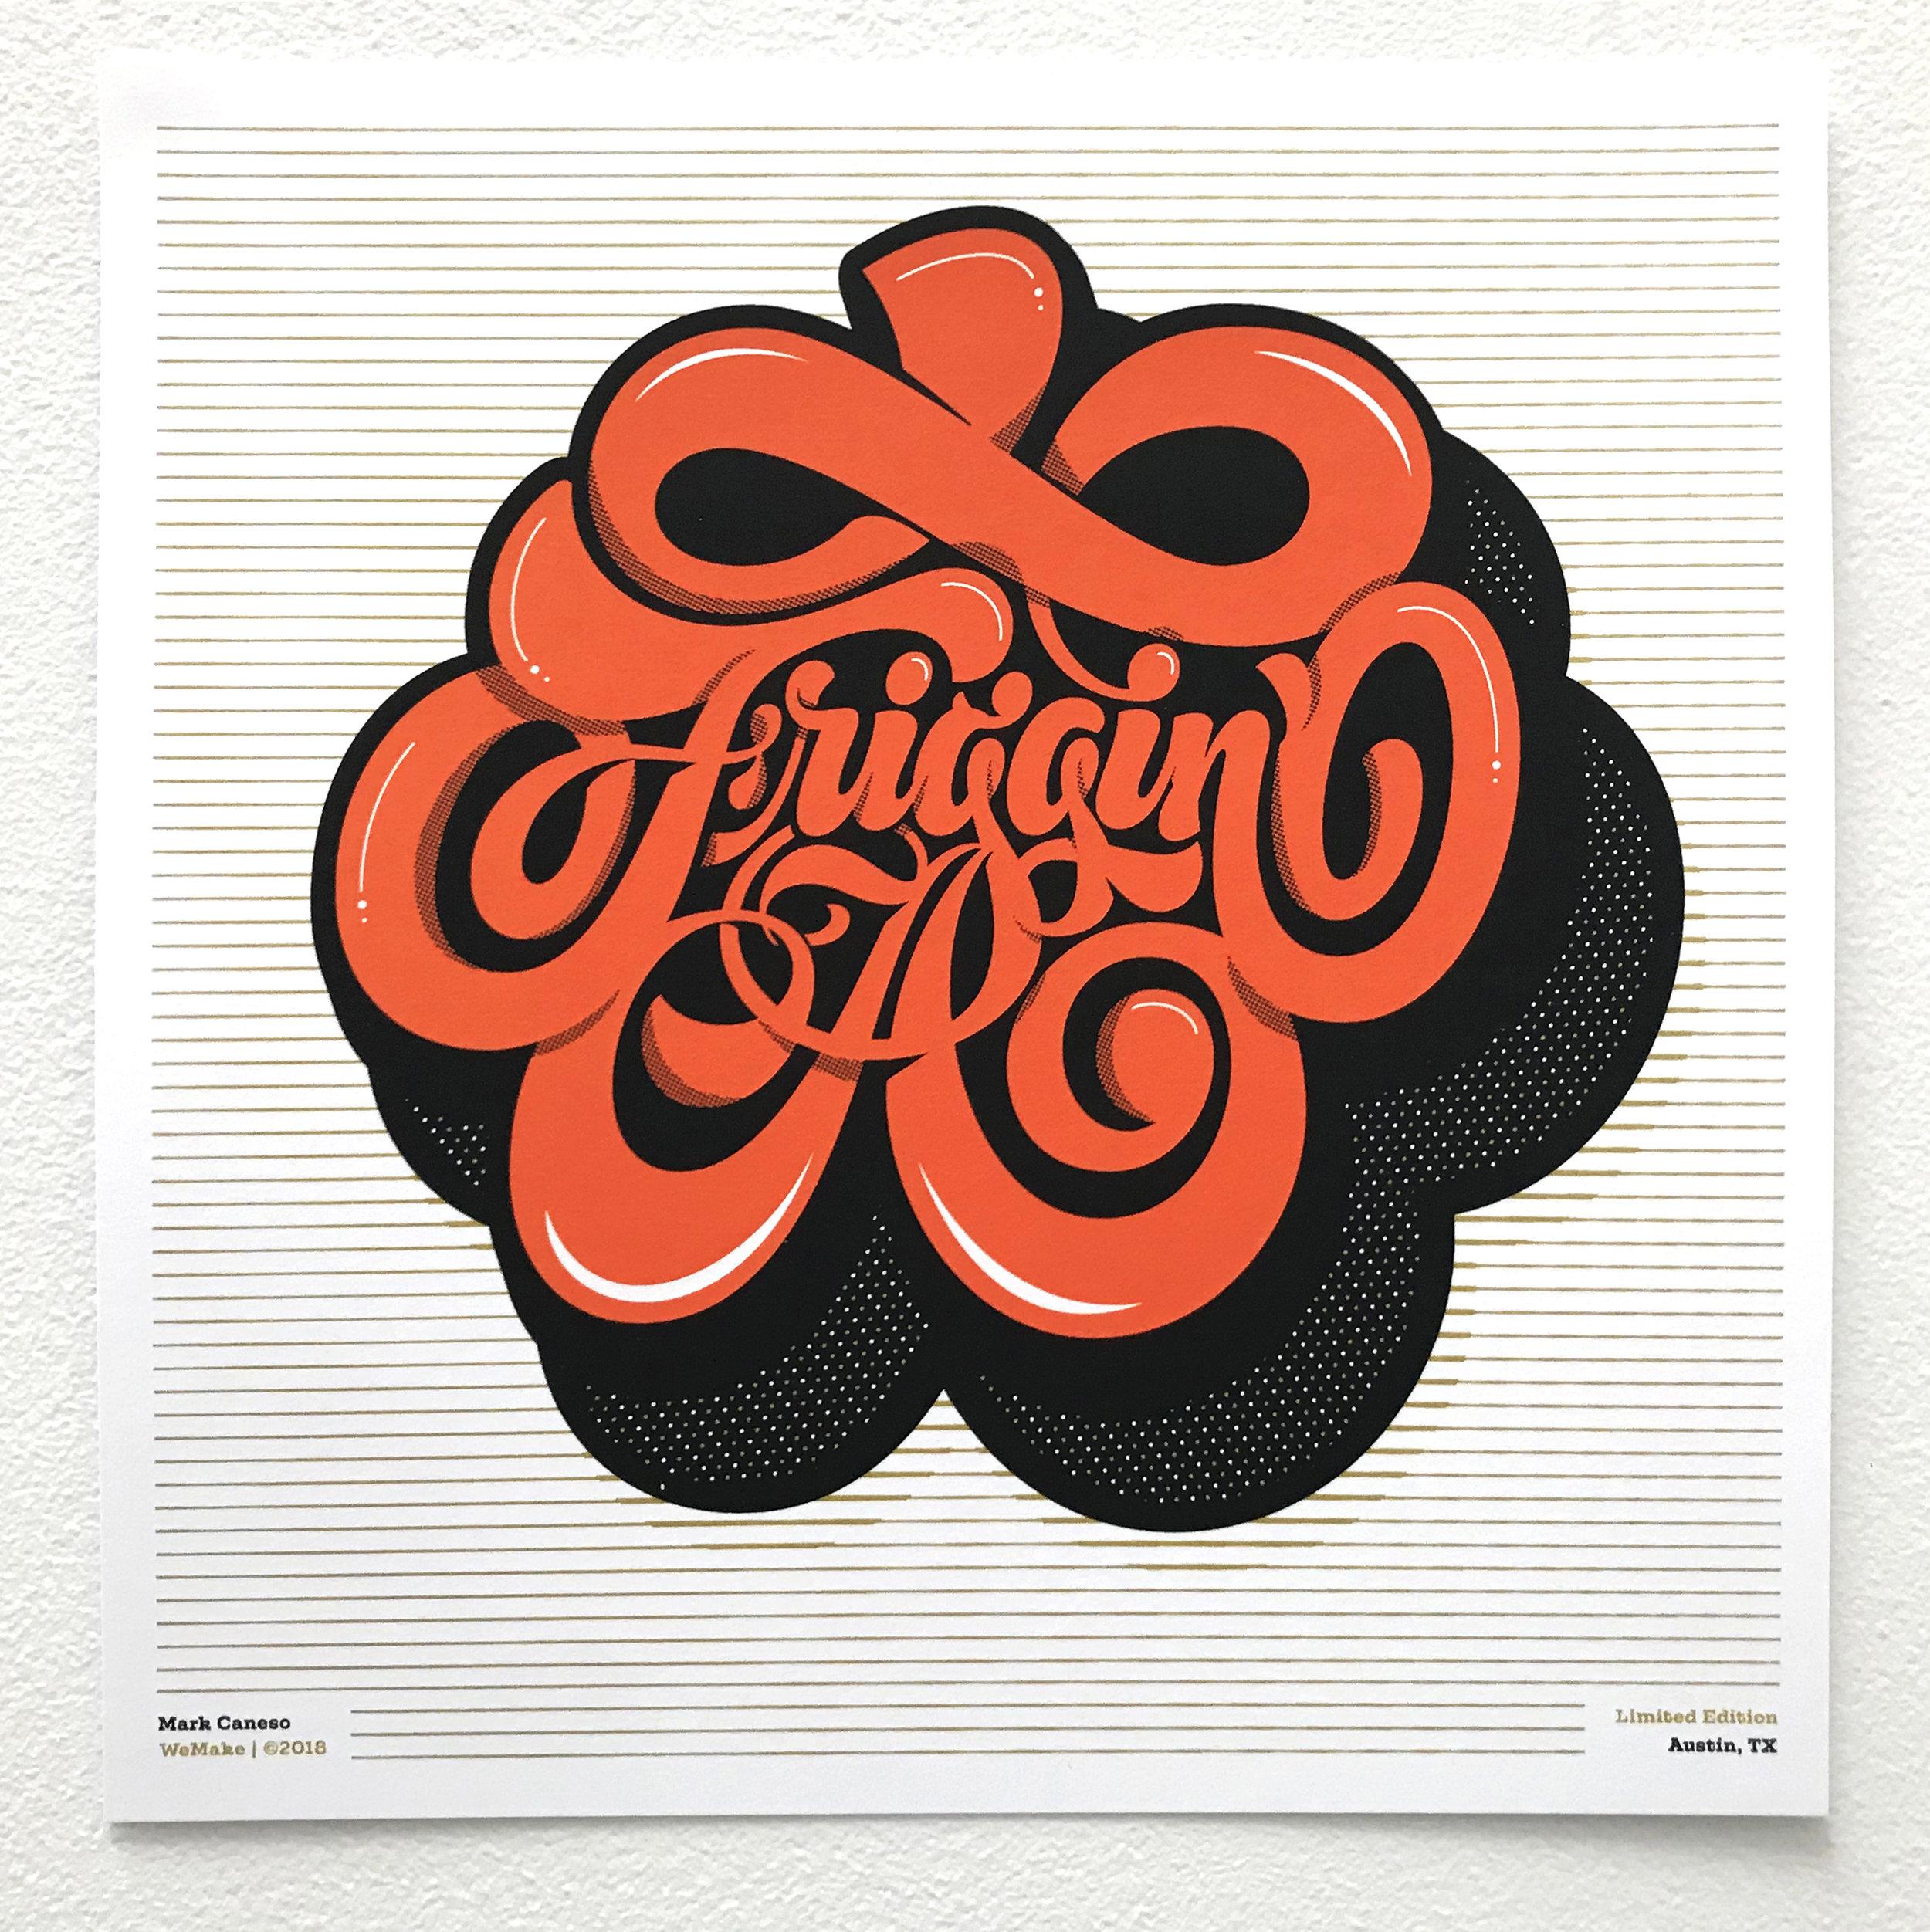 Friggin A — pprwrk studio